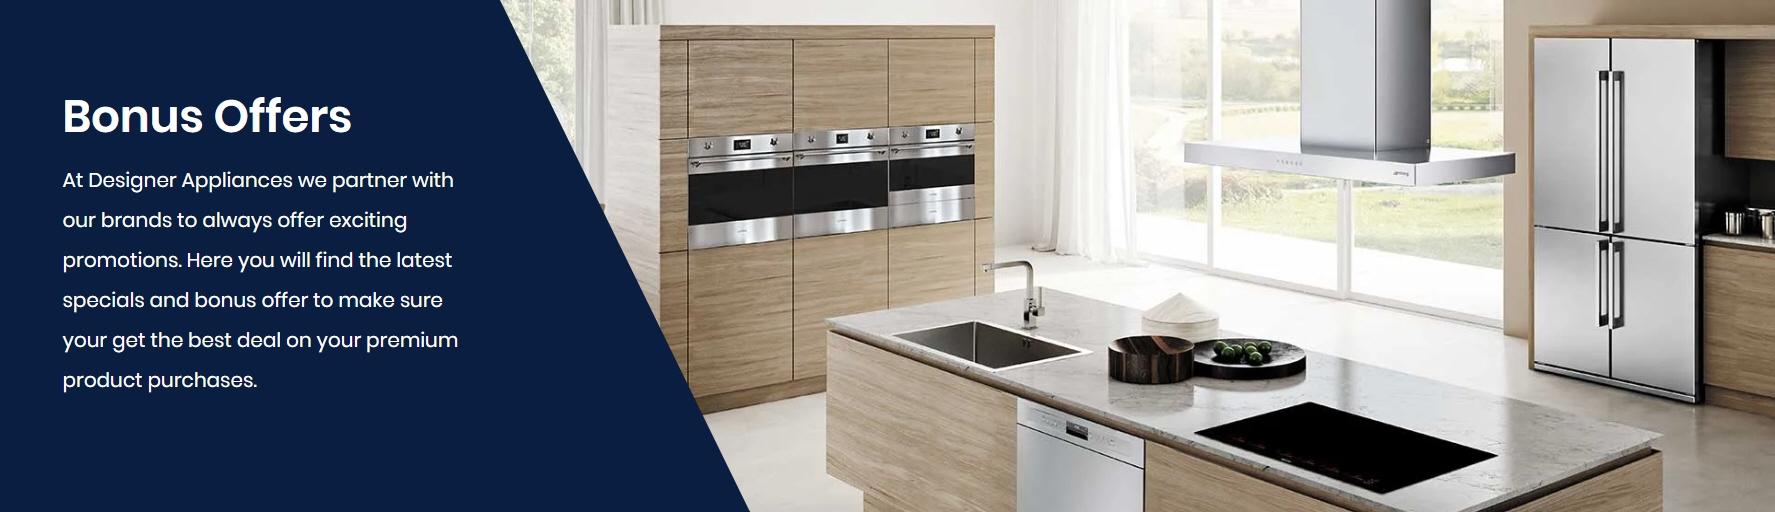 Designer Appliances Bonus Promotion Offers